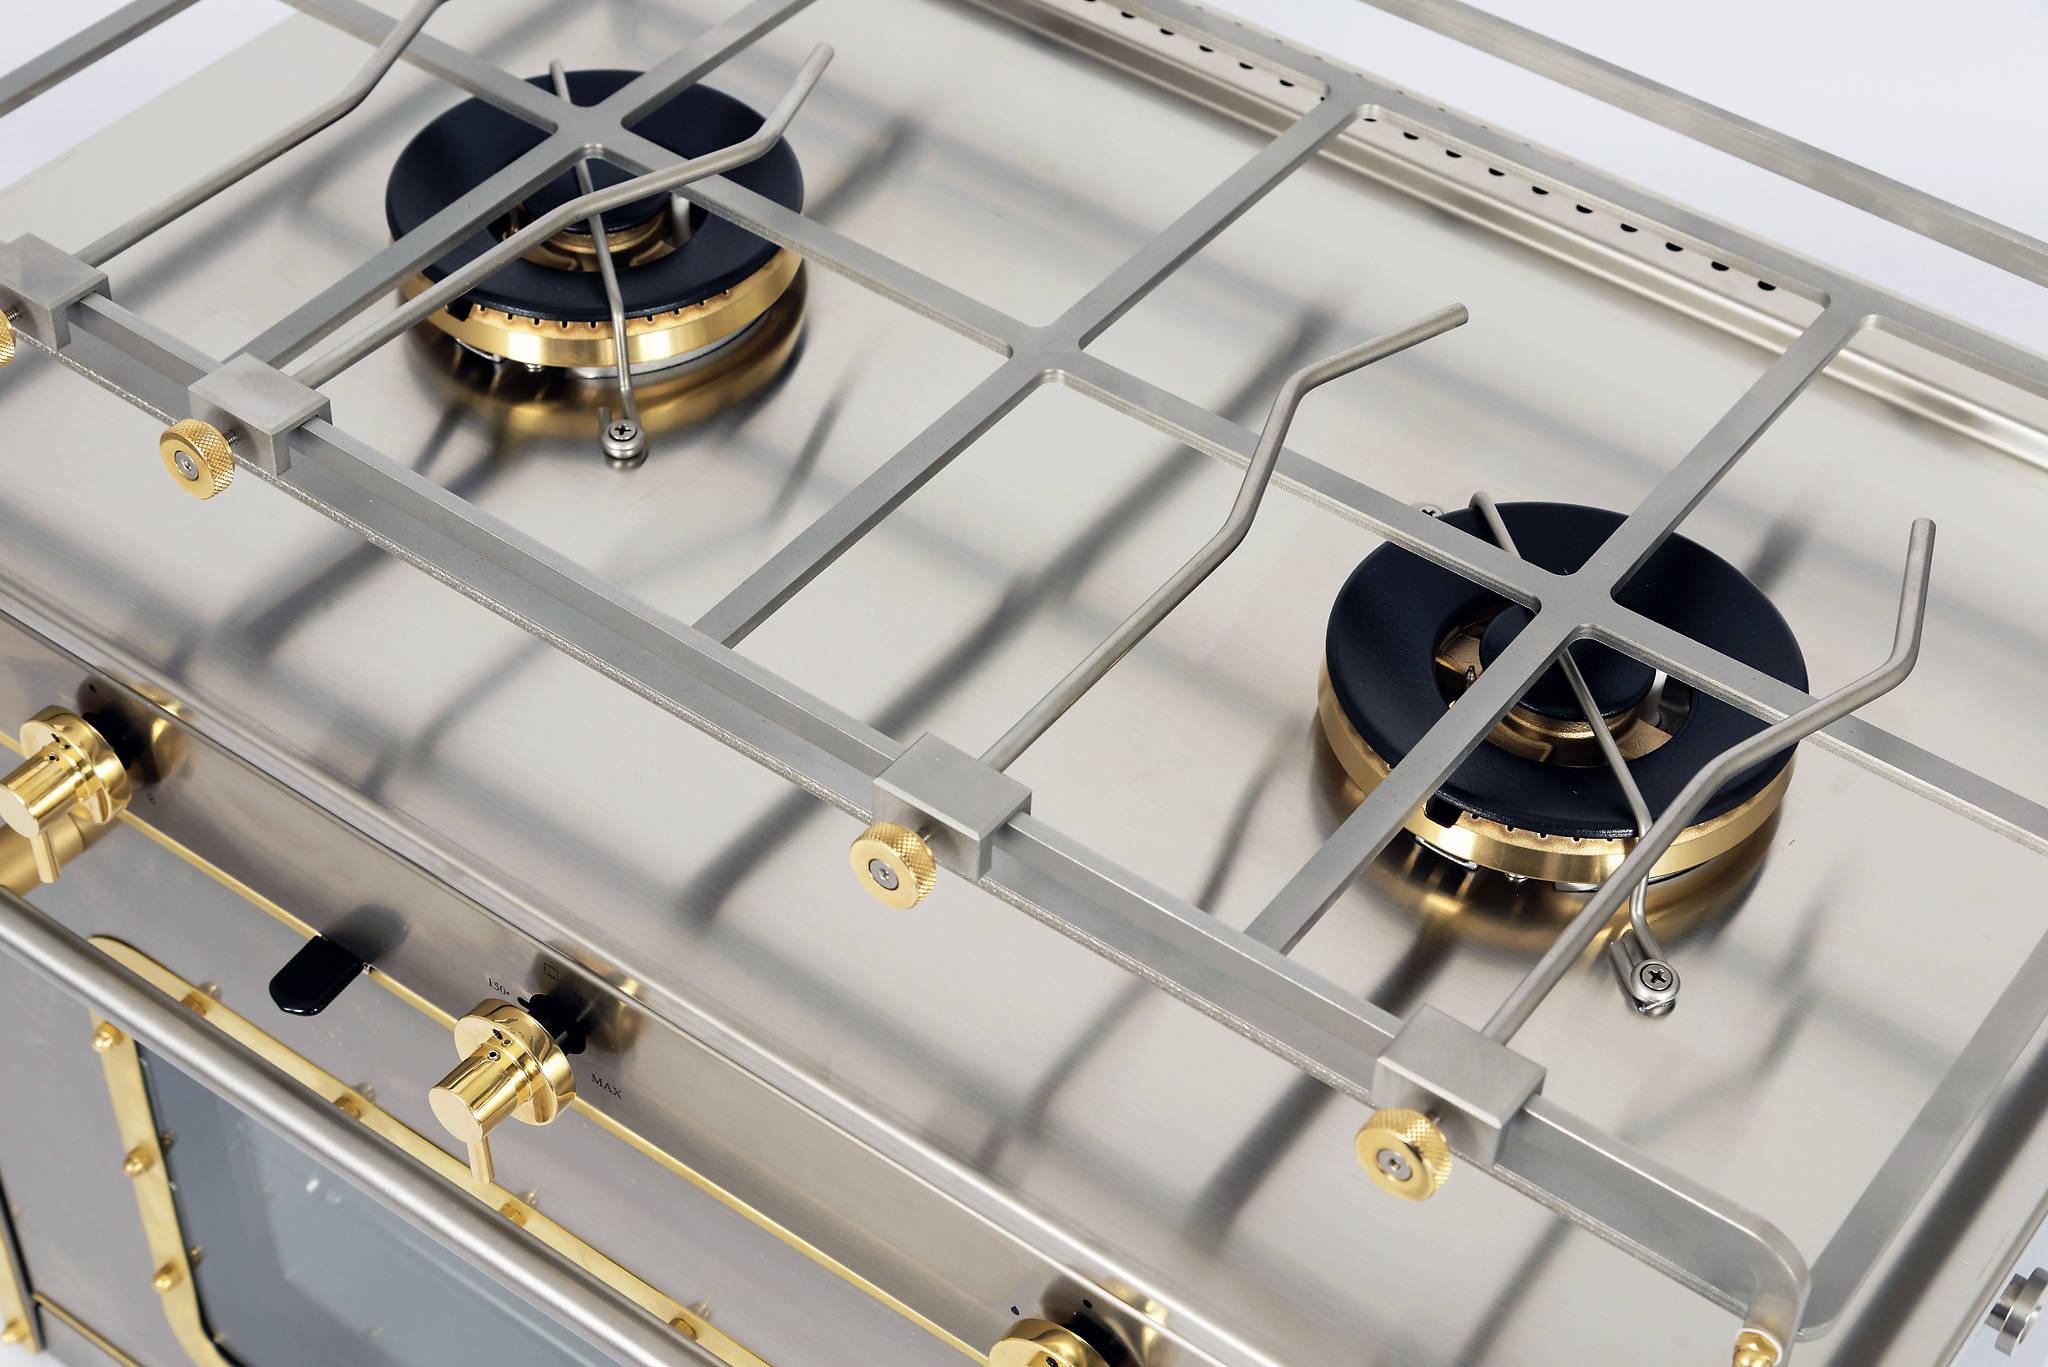 classic cooker30.jpg